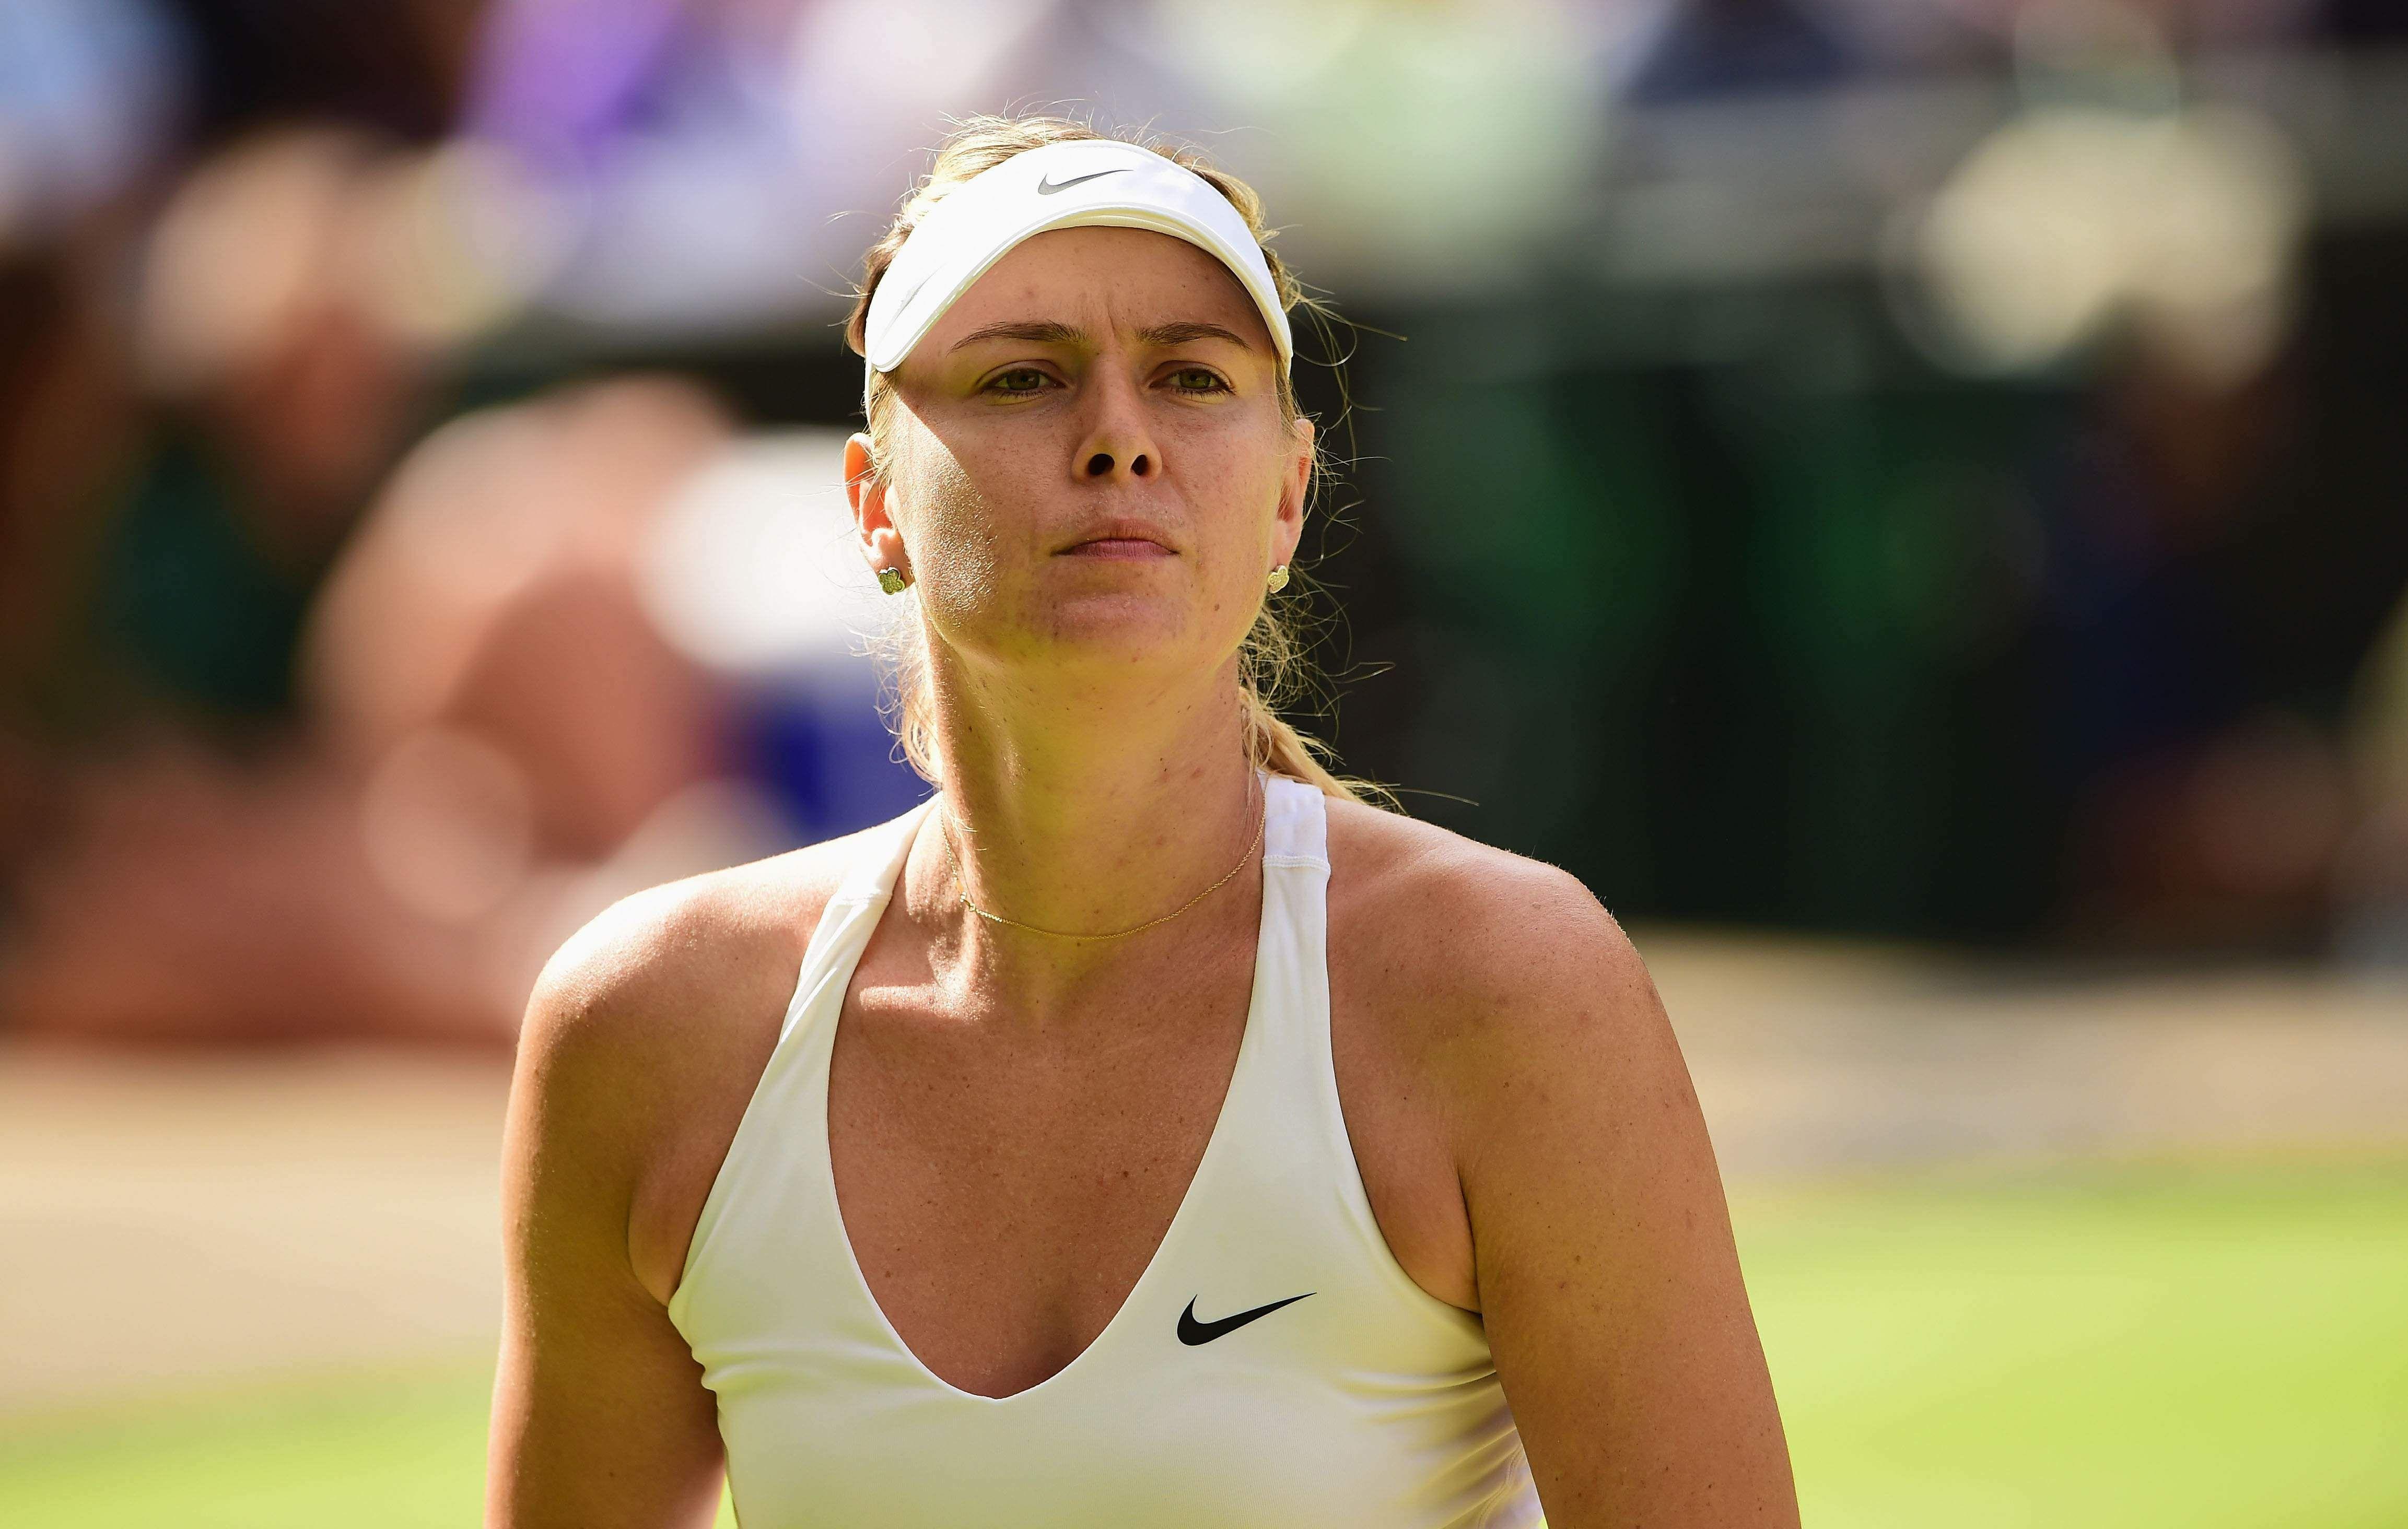 Maria Sharapova wins in Wimbledon Quarter Final | Maria